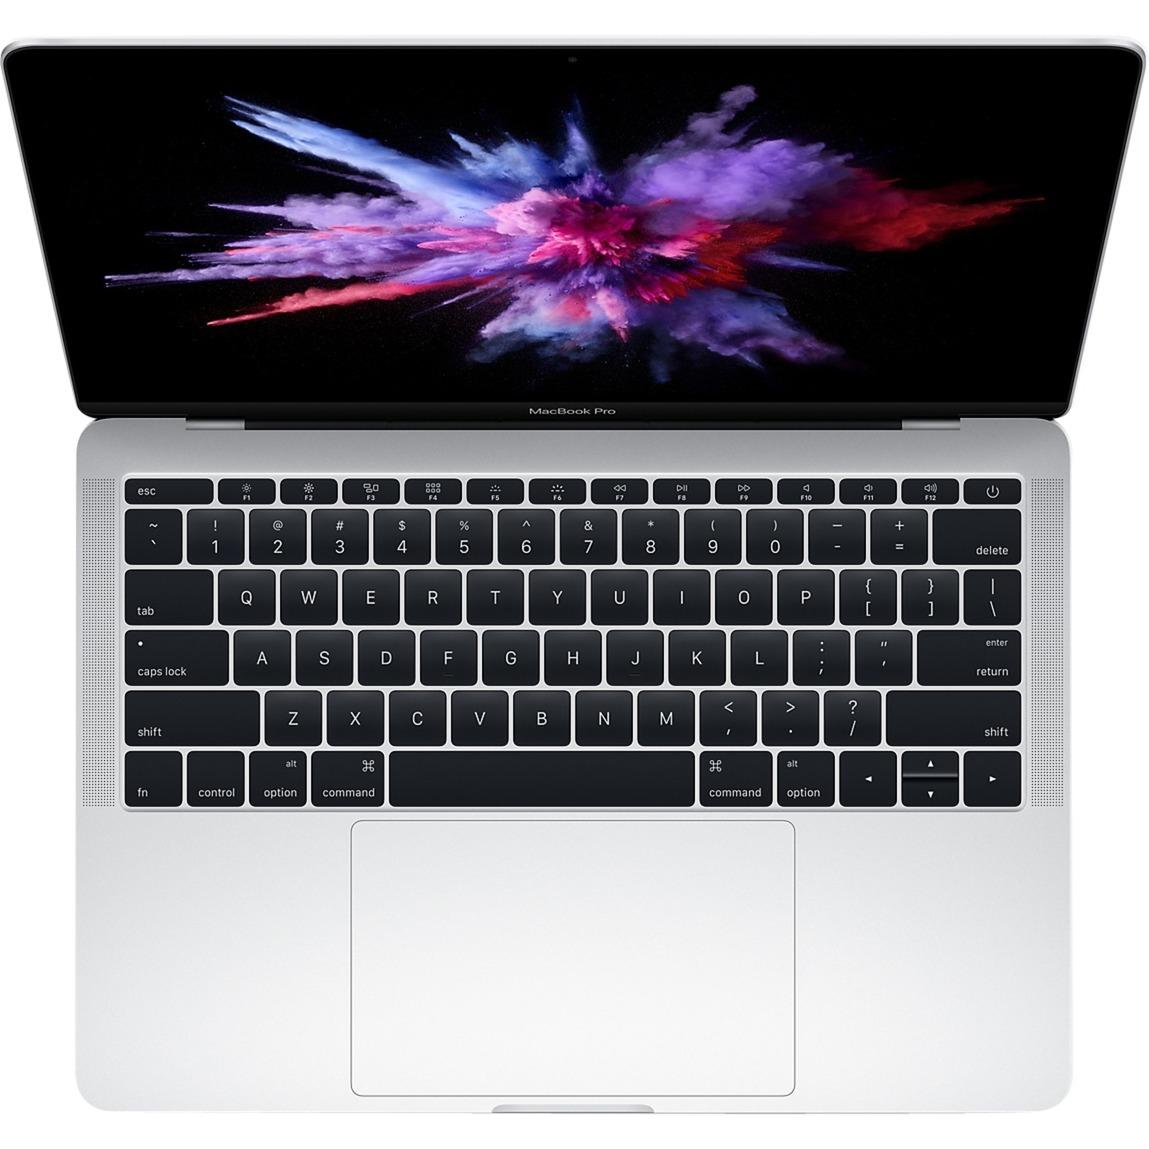 "MacBook Pro Plata Portátil 33,8 cm (13.3"") 2560 x 1600 Pixeles 2,3 GHz 7ª generación de procesadores Intel Core i5"